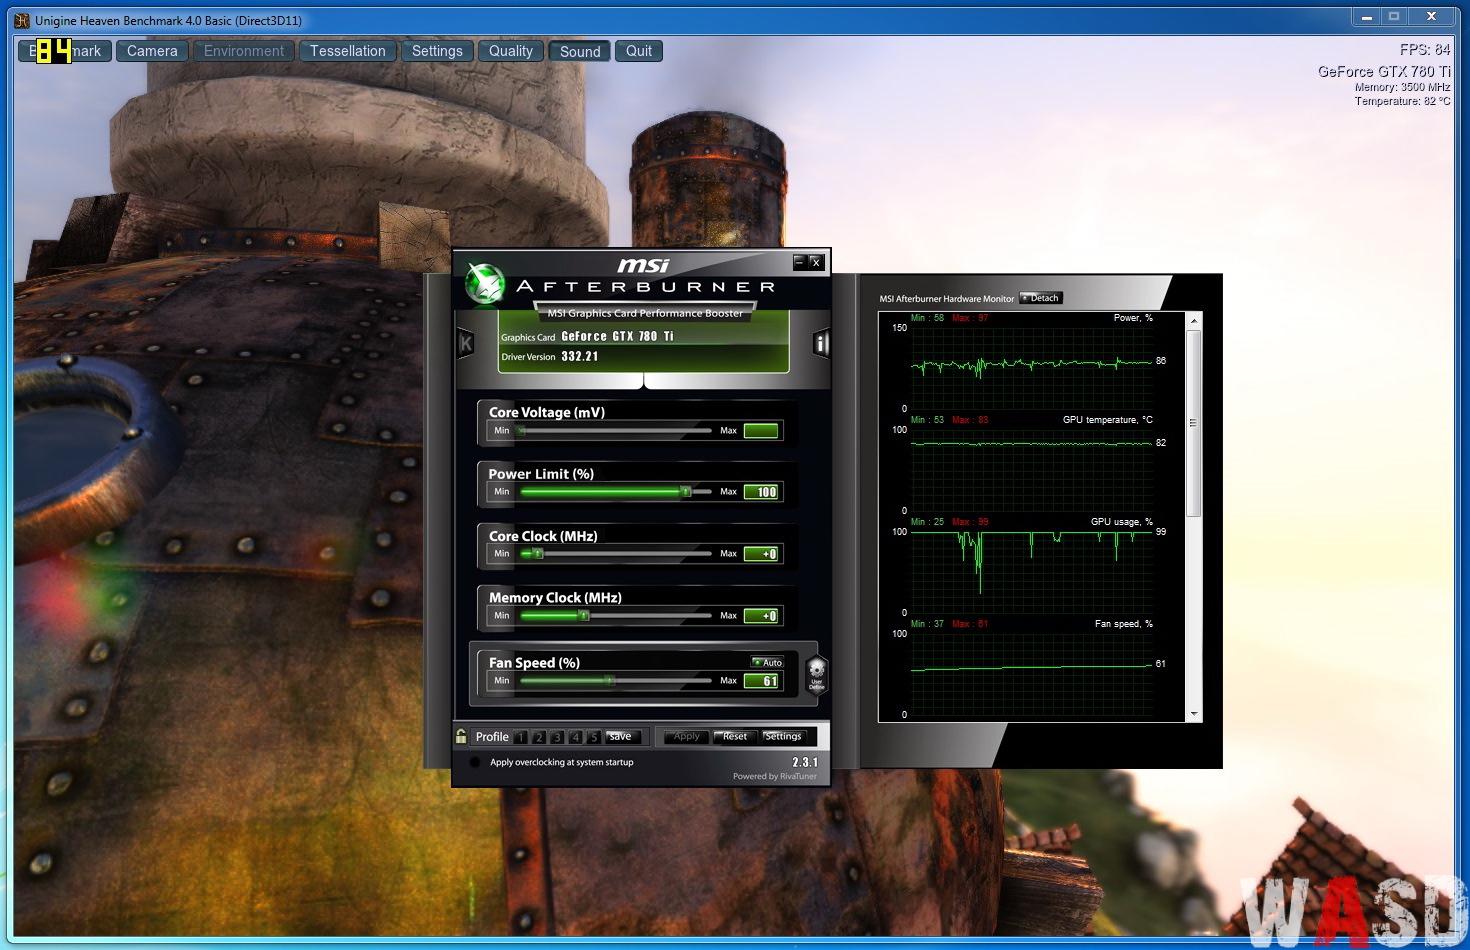 temp-load-ref-780-ti